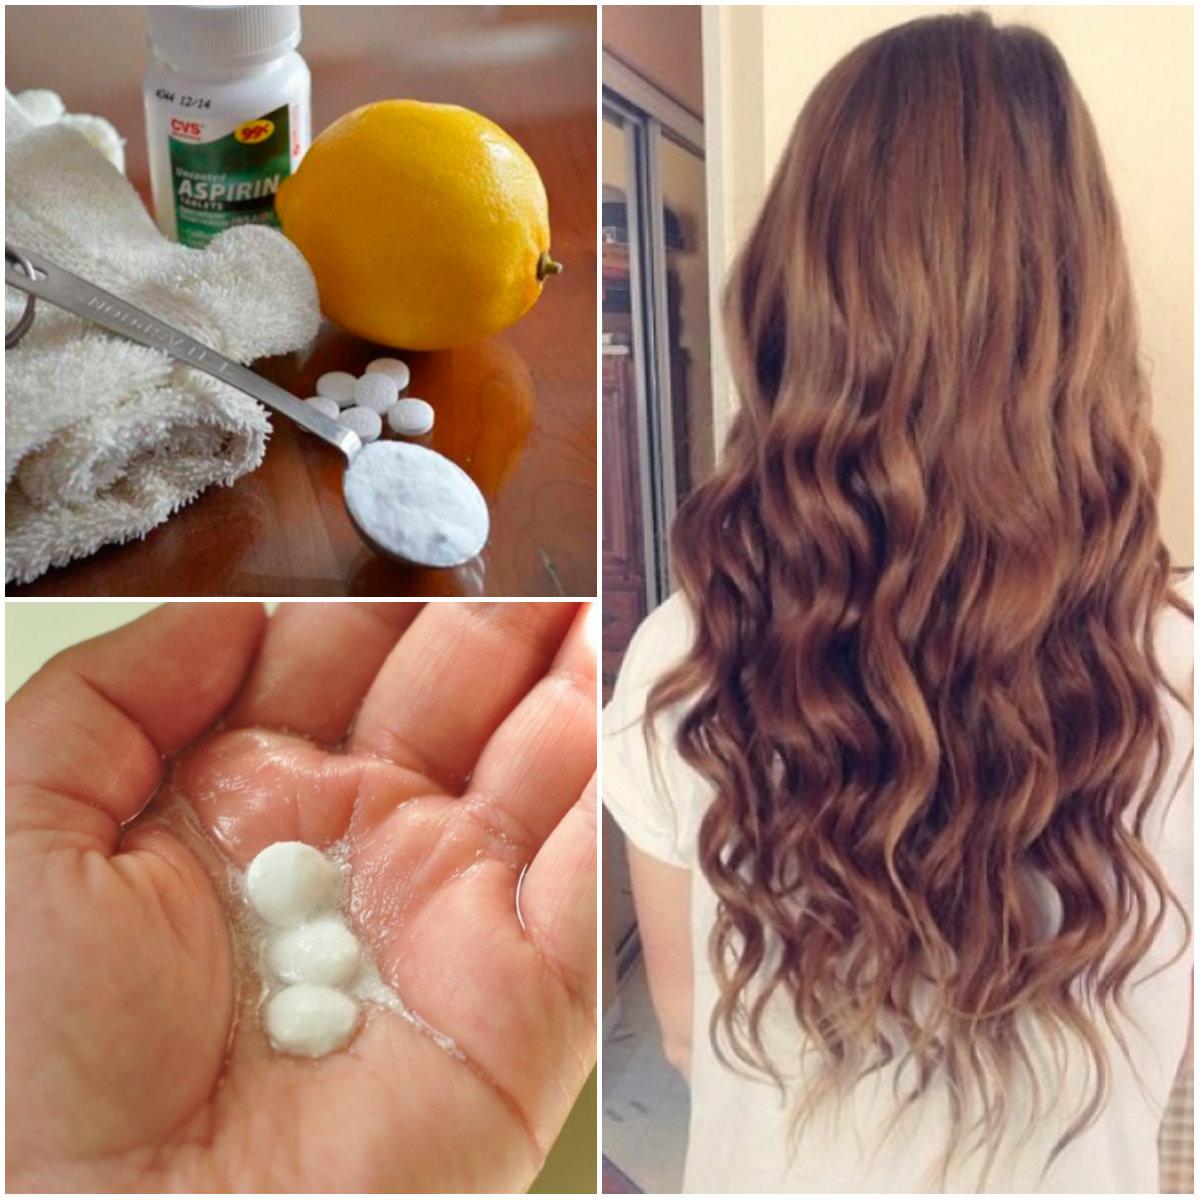 аспирин для волос фото 1